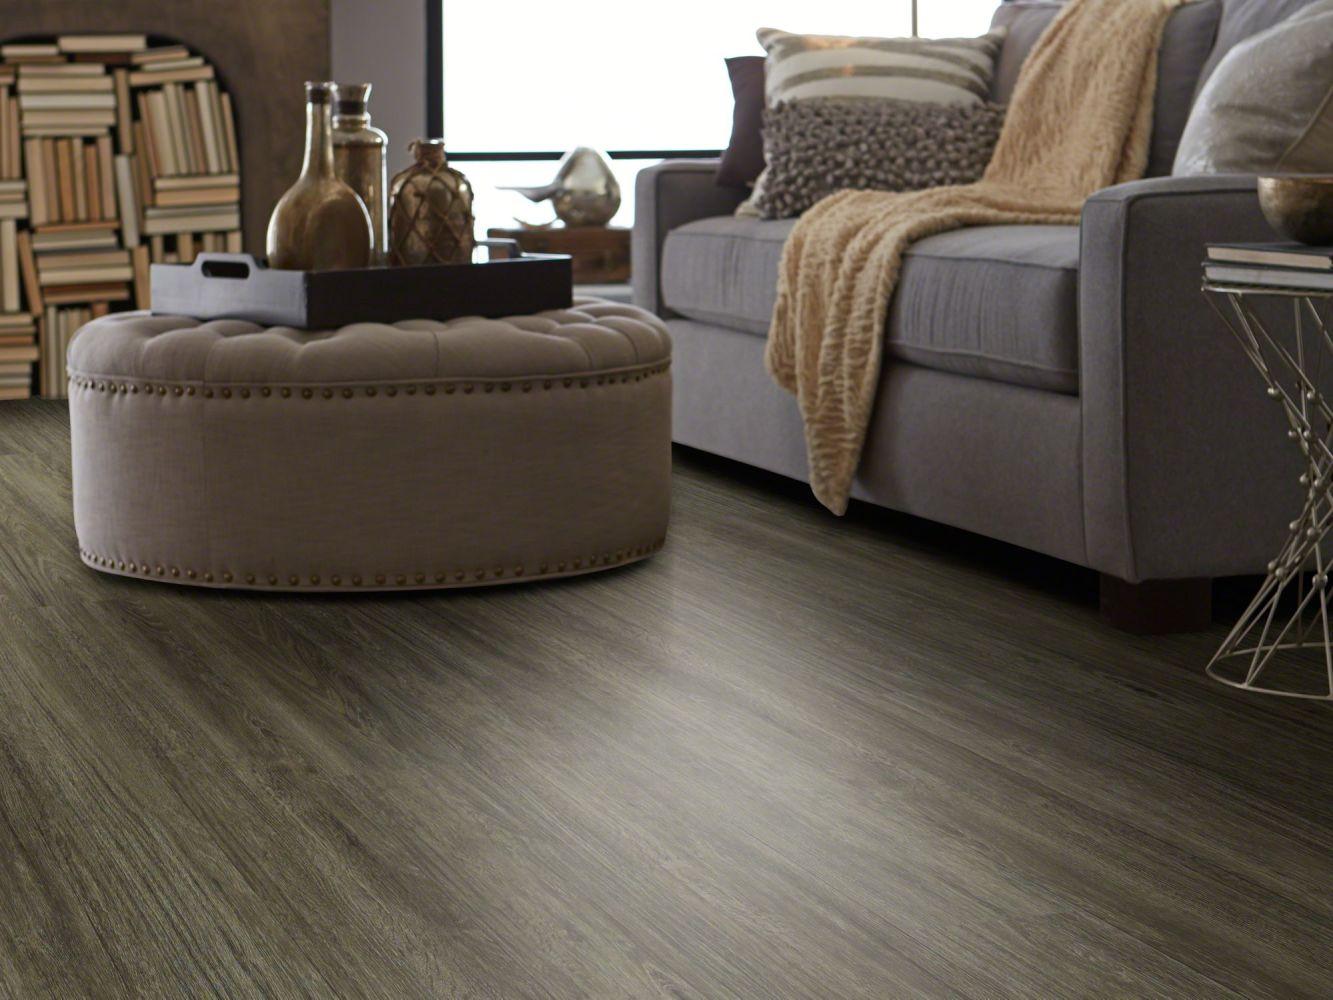 Shaw Floors Resilient Residential Alto Plus Plank Presanella 00503_2576V